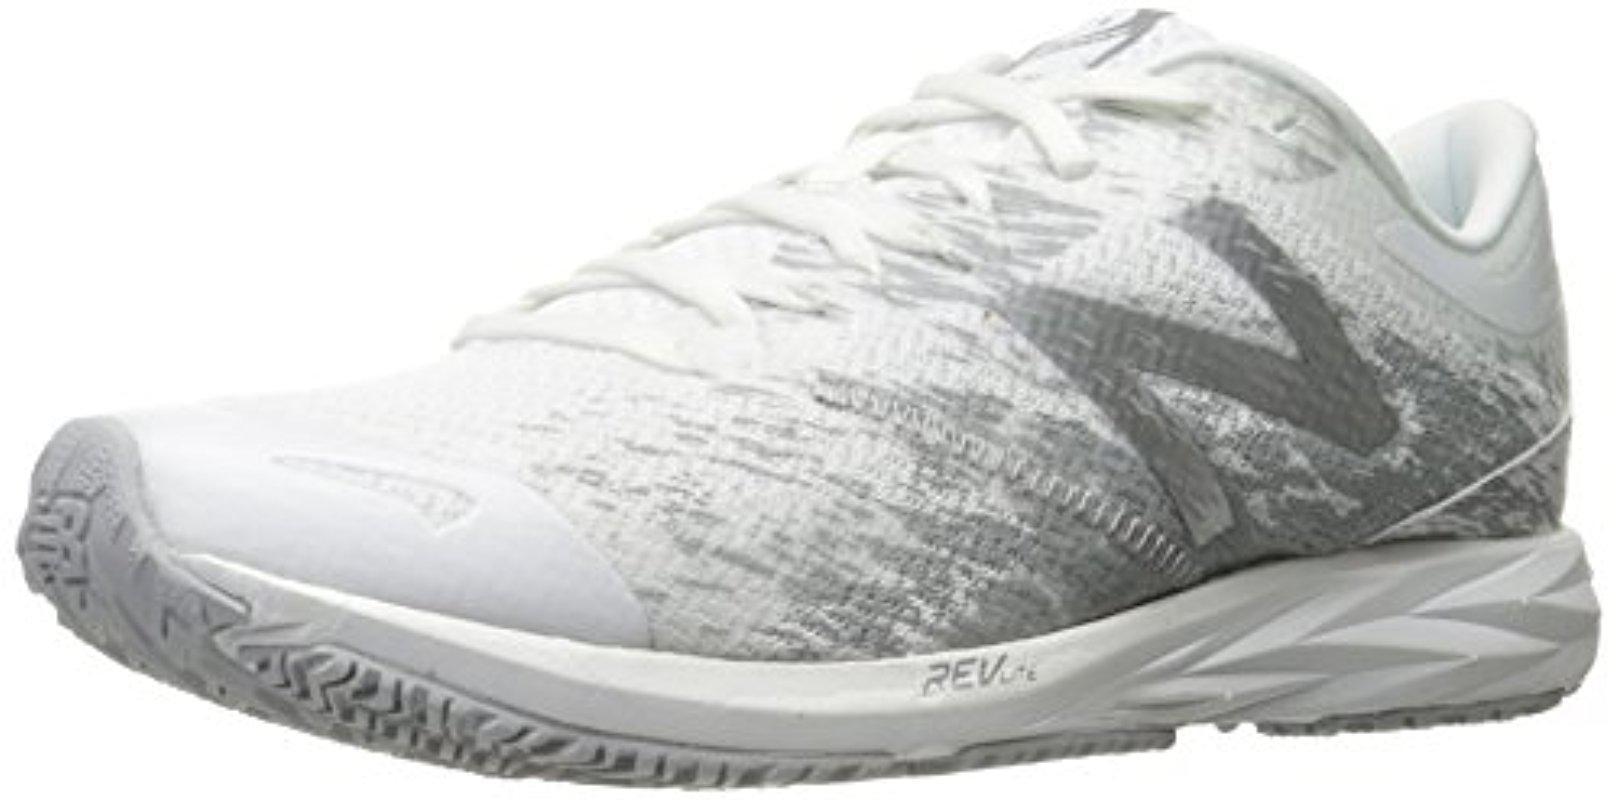 New Balance Strobe V1, Running Shoes in